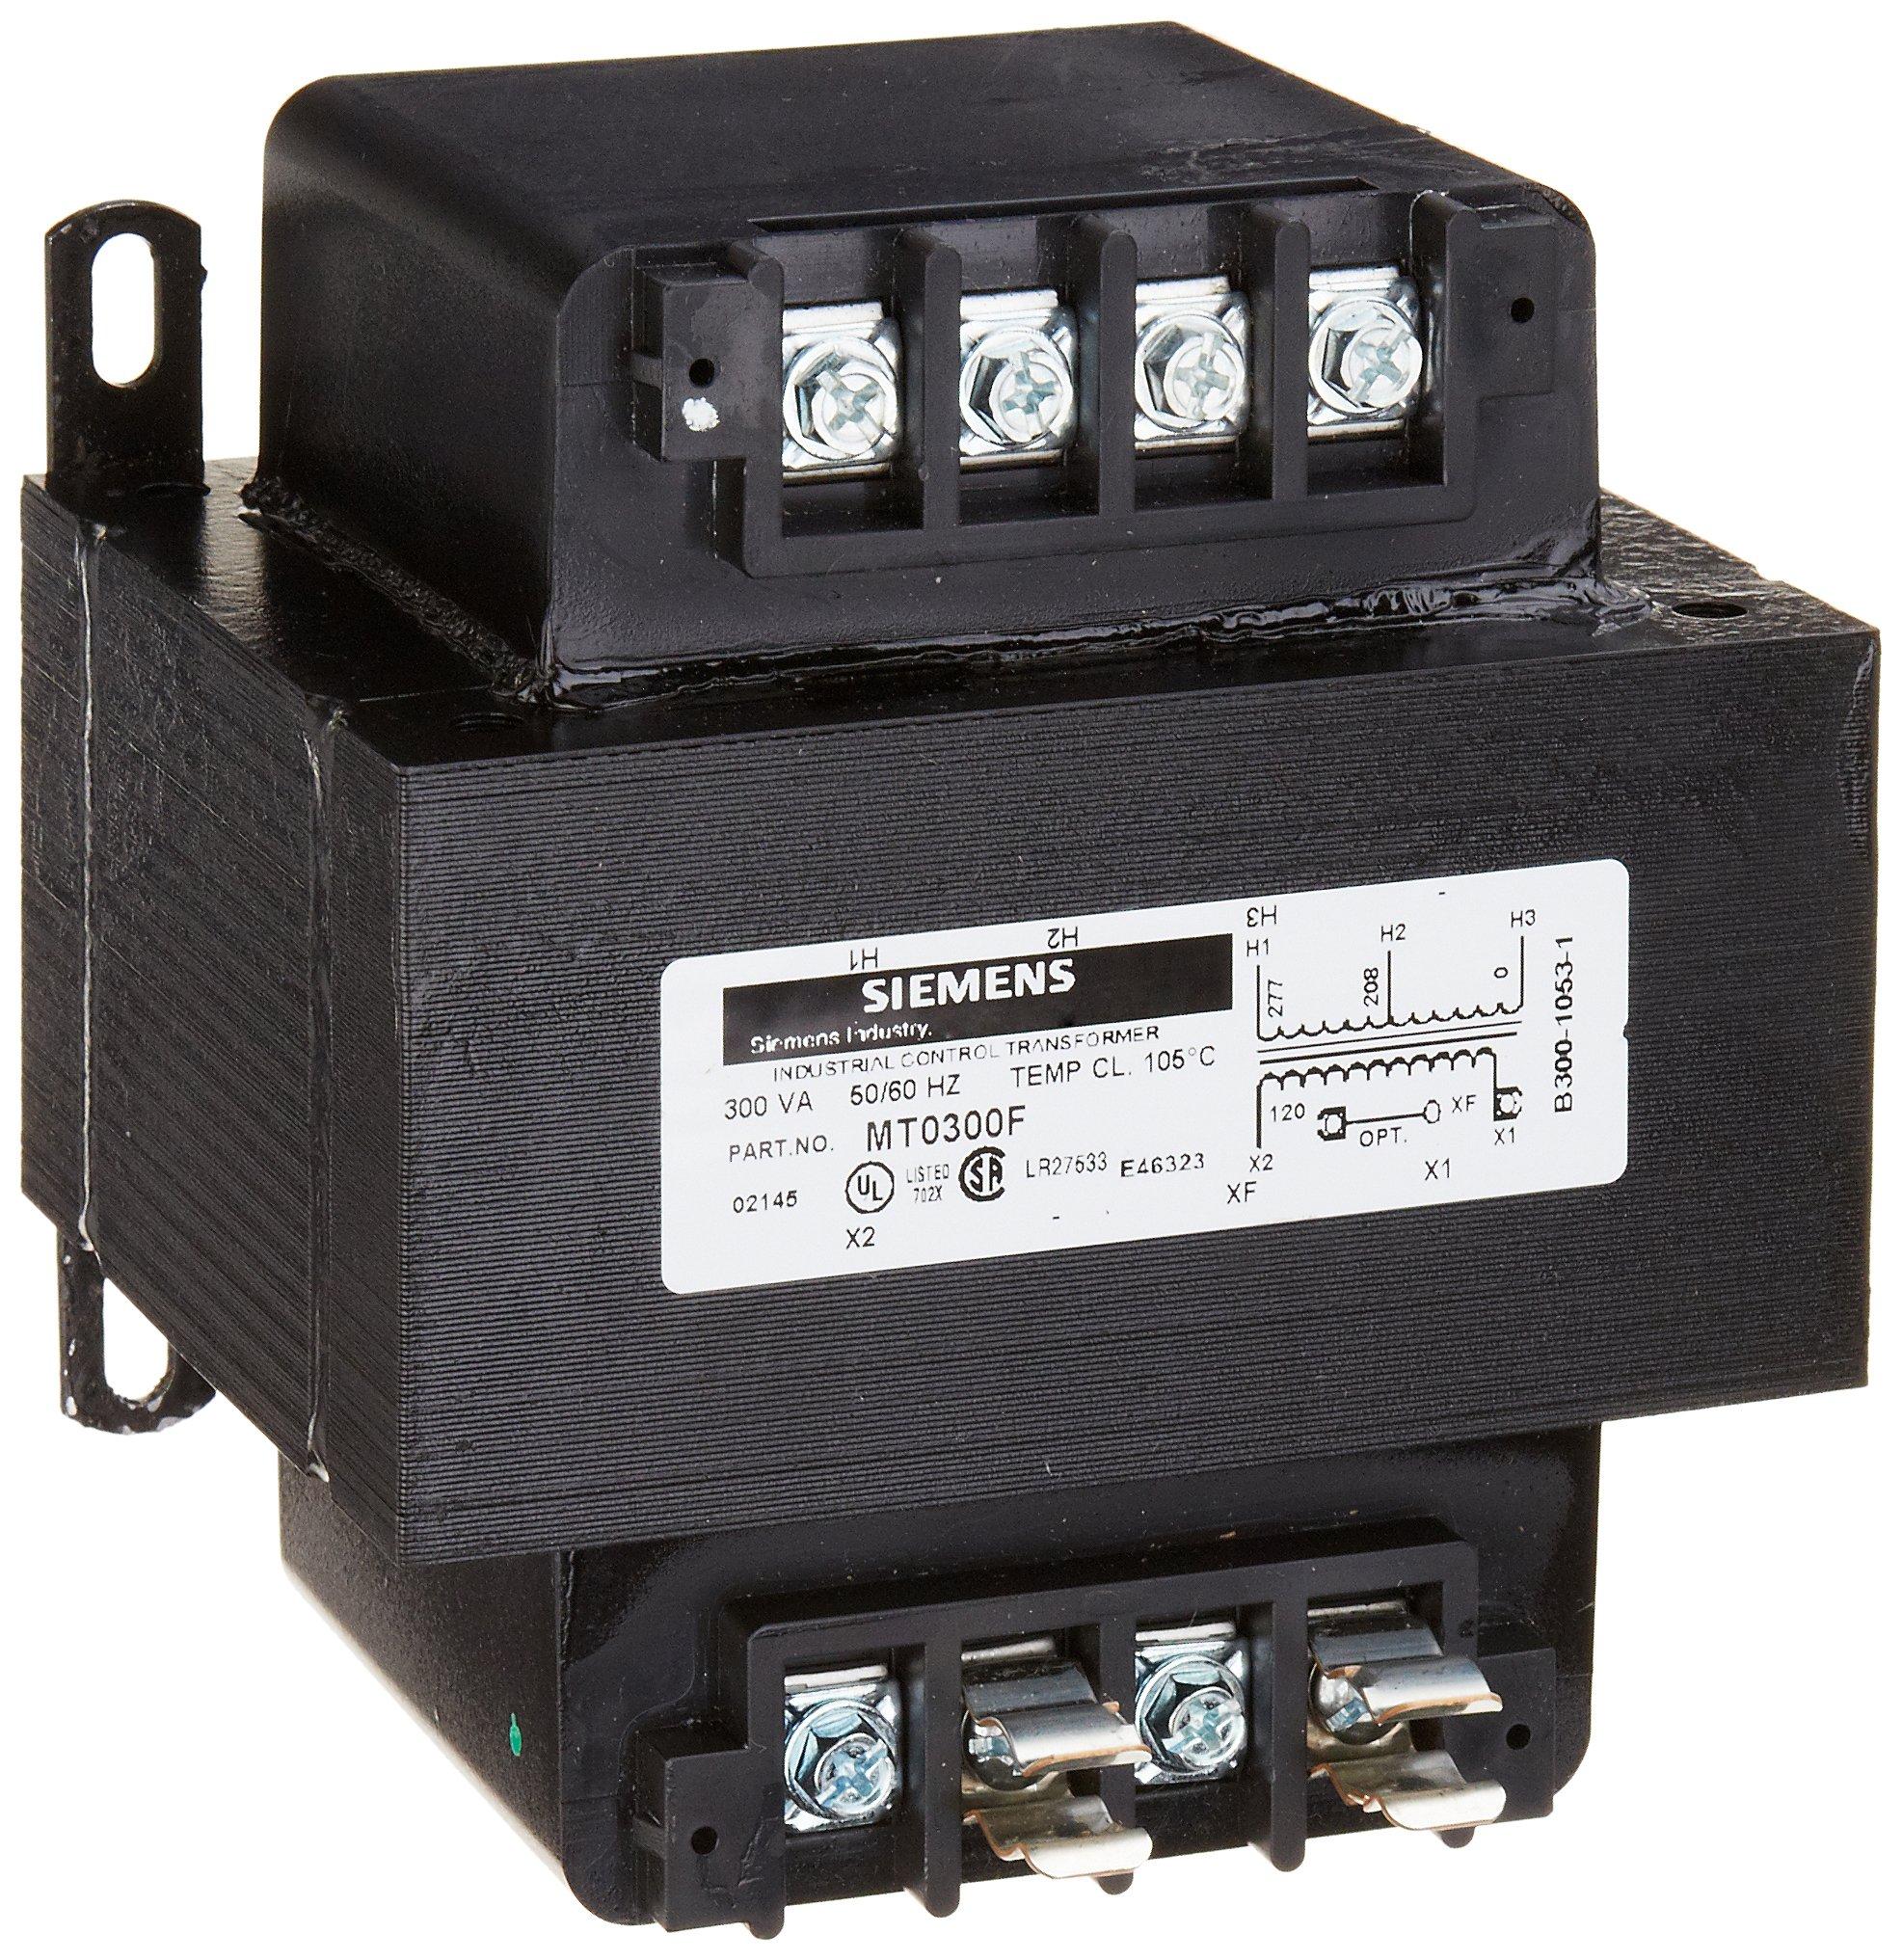 Siemens MTG0100J Industrial Power Transformer, International, 208/230/460,200/220/440,240/480 Primary Volts 50/60Hz, 24 X 115,23 X 110,25 X 120 Secondary Volts, 100VA Rating